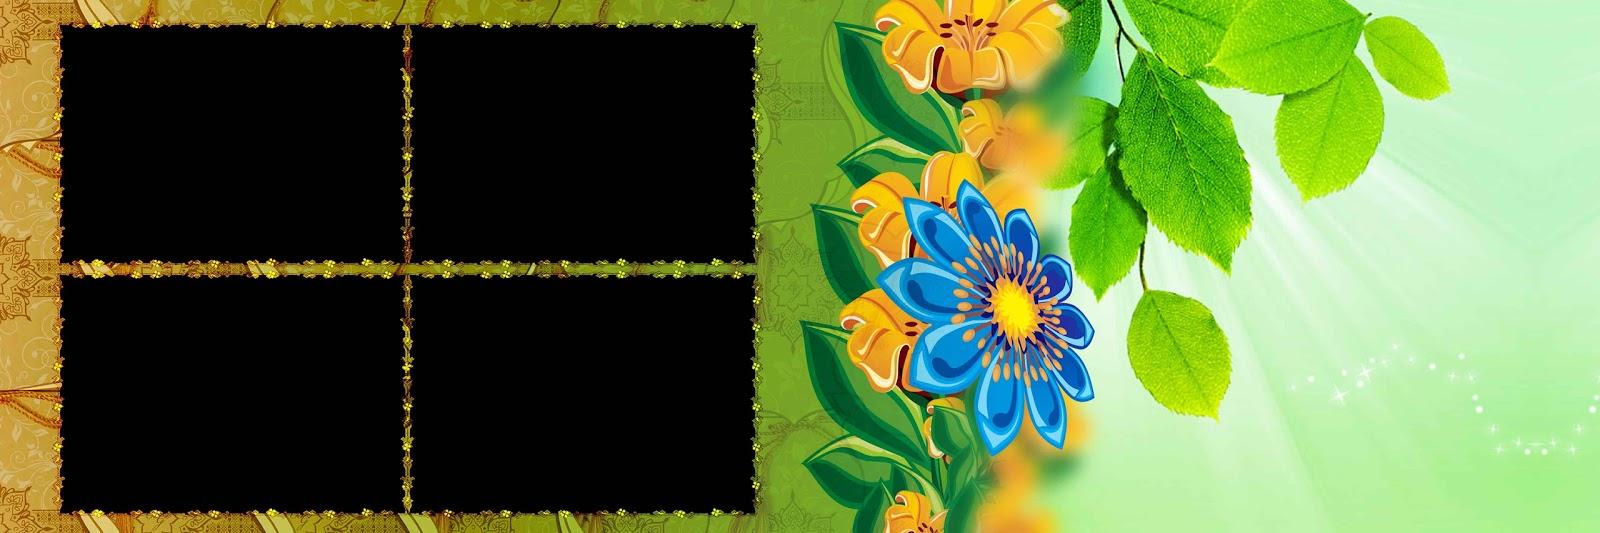 ... design 10x30 free download | StudioPk | Provide Do Photoshop PSD File